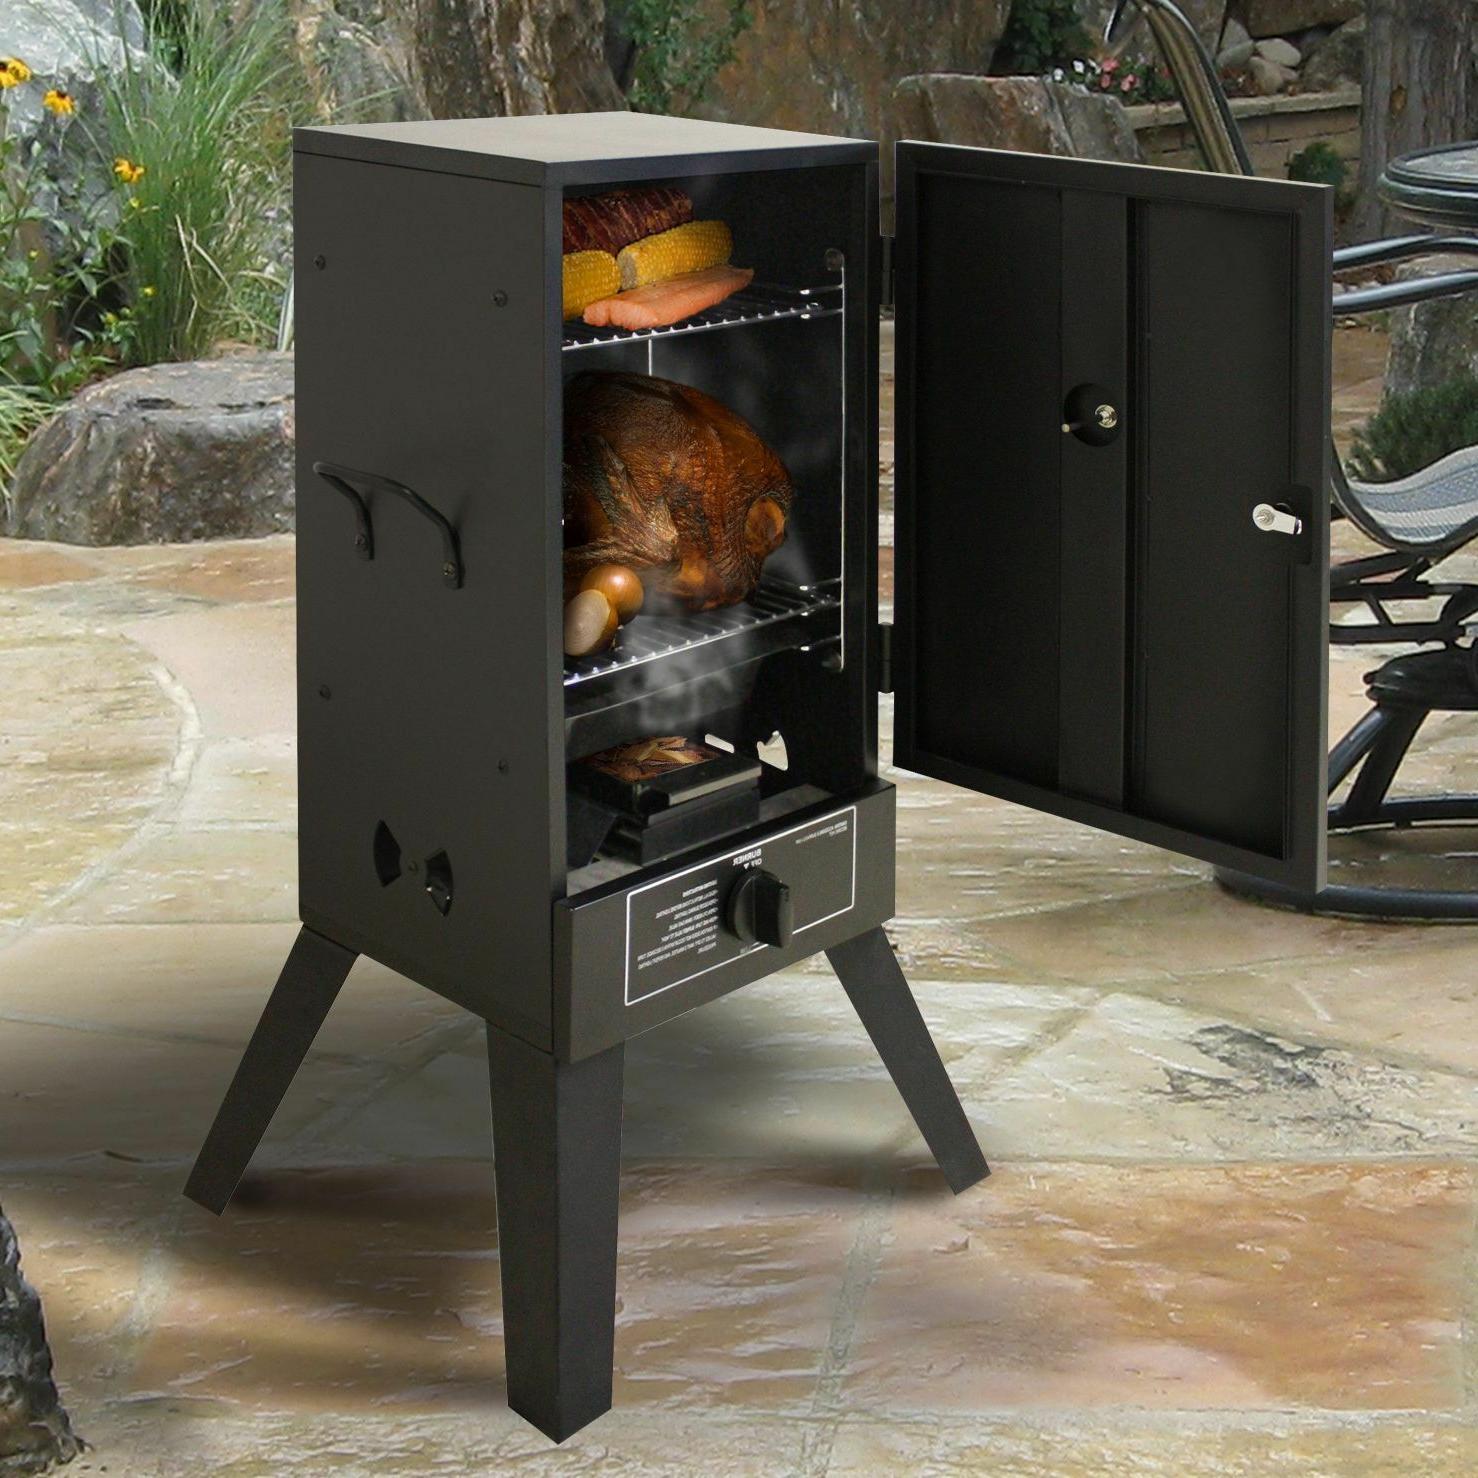 Gas Grill Propane Vertical BBQ Wood Burner Smoke